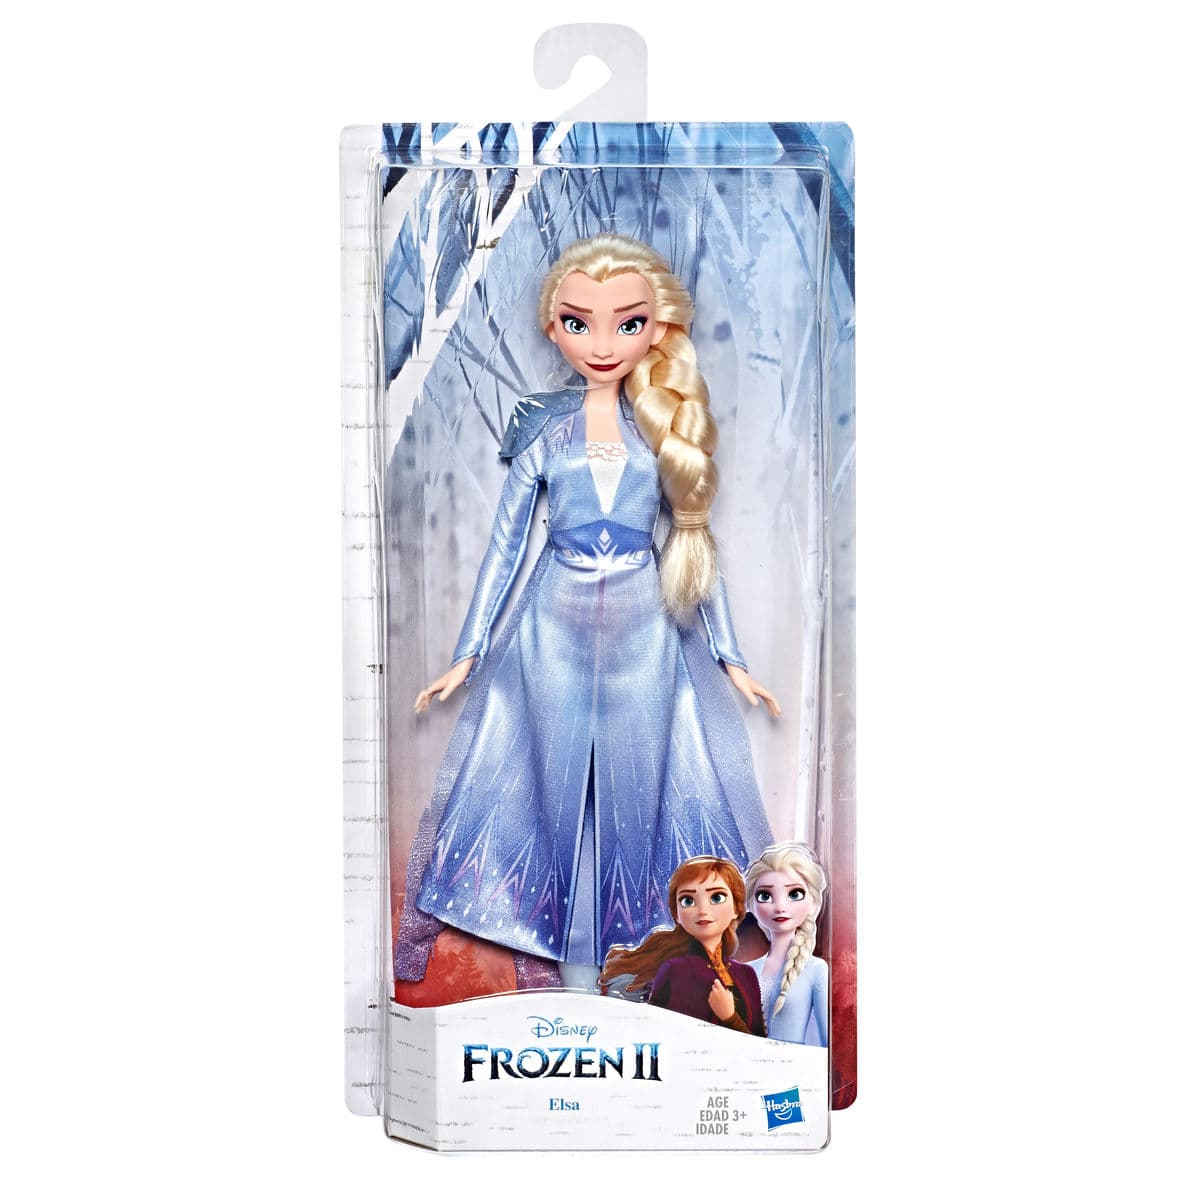 Disney Frozen II Elsa Puppe mit Outfit Puppe